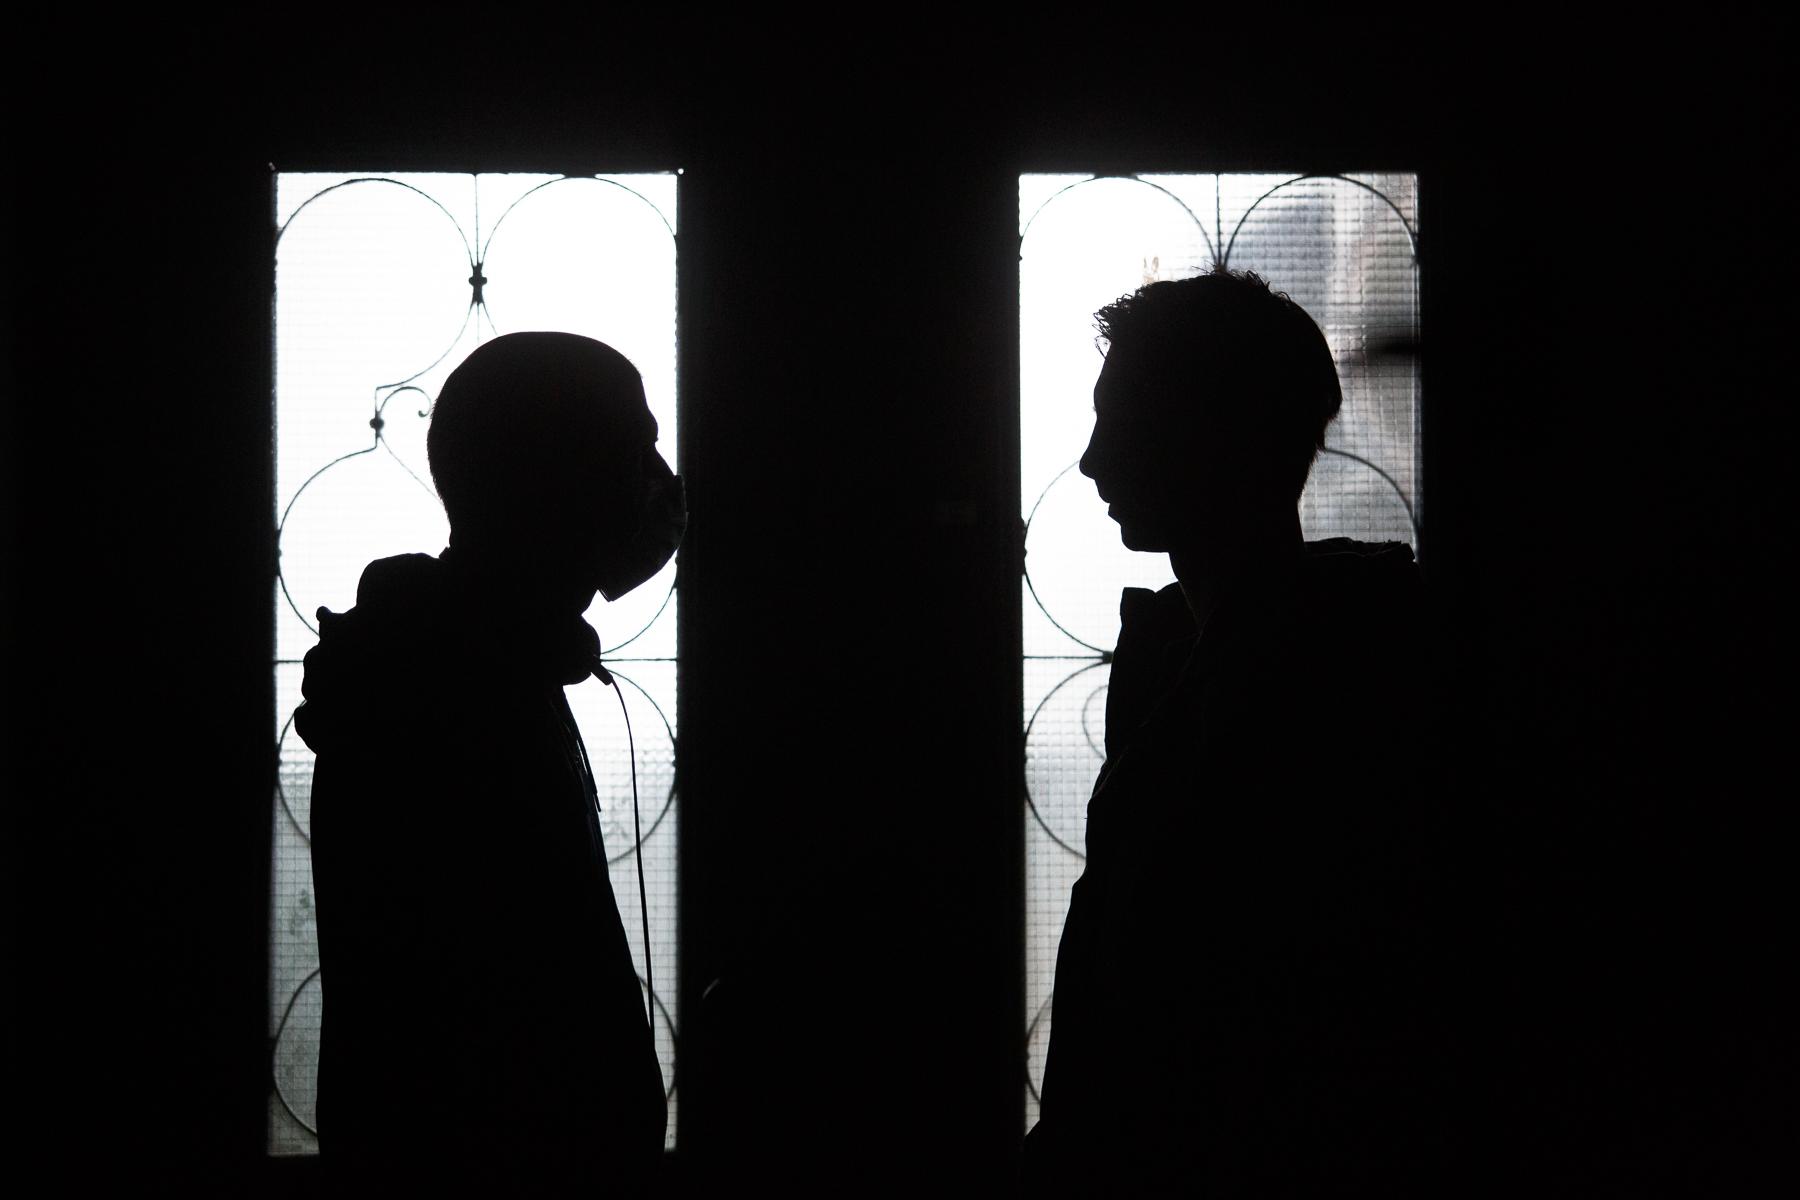 Director Marko Šantić and lead actor Jure Henigman on the set of Wake Me.